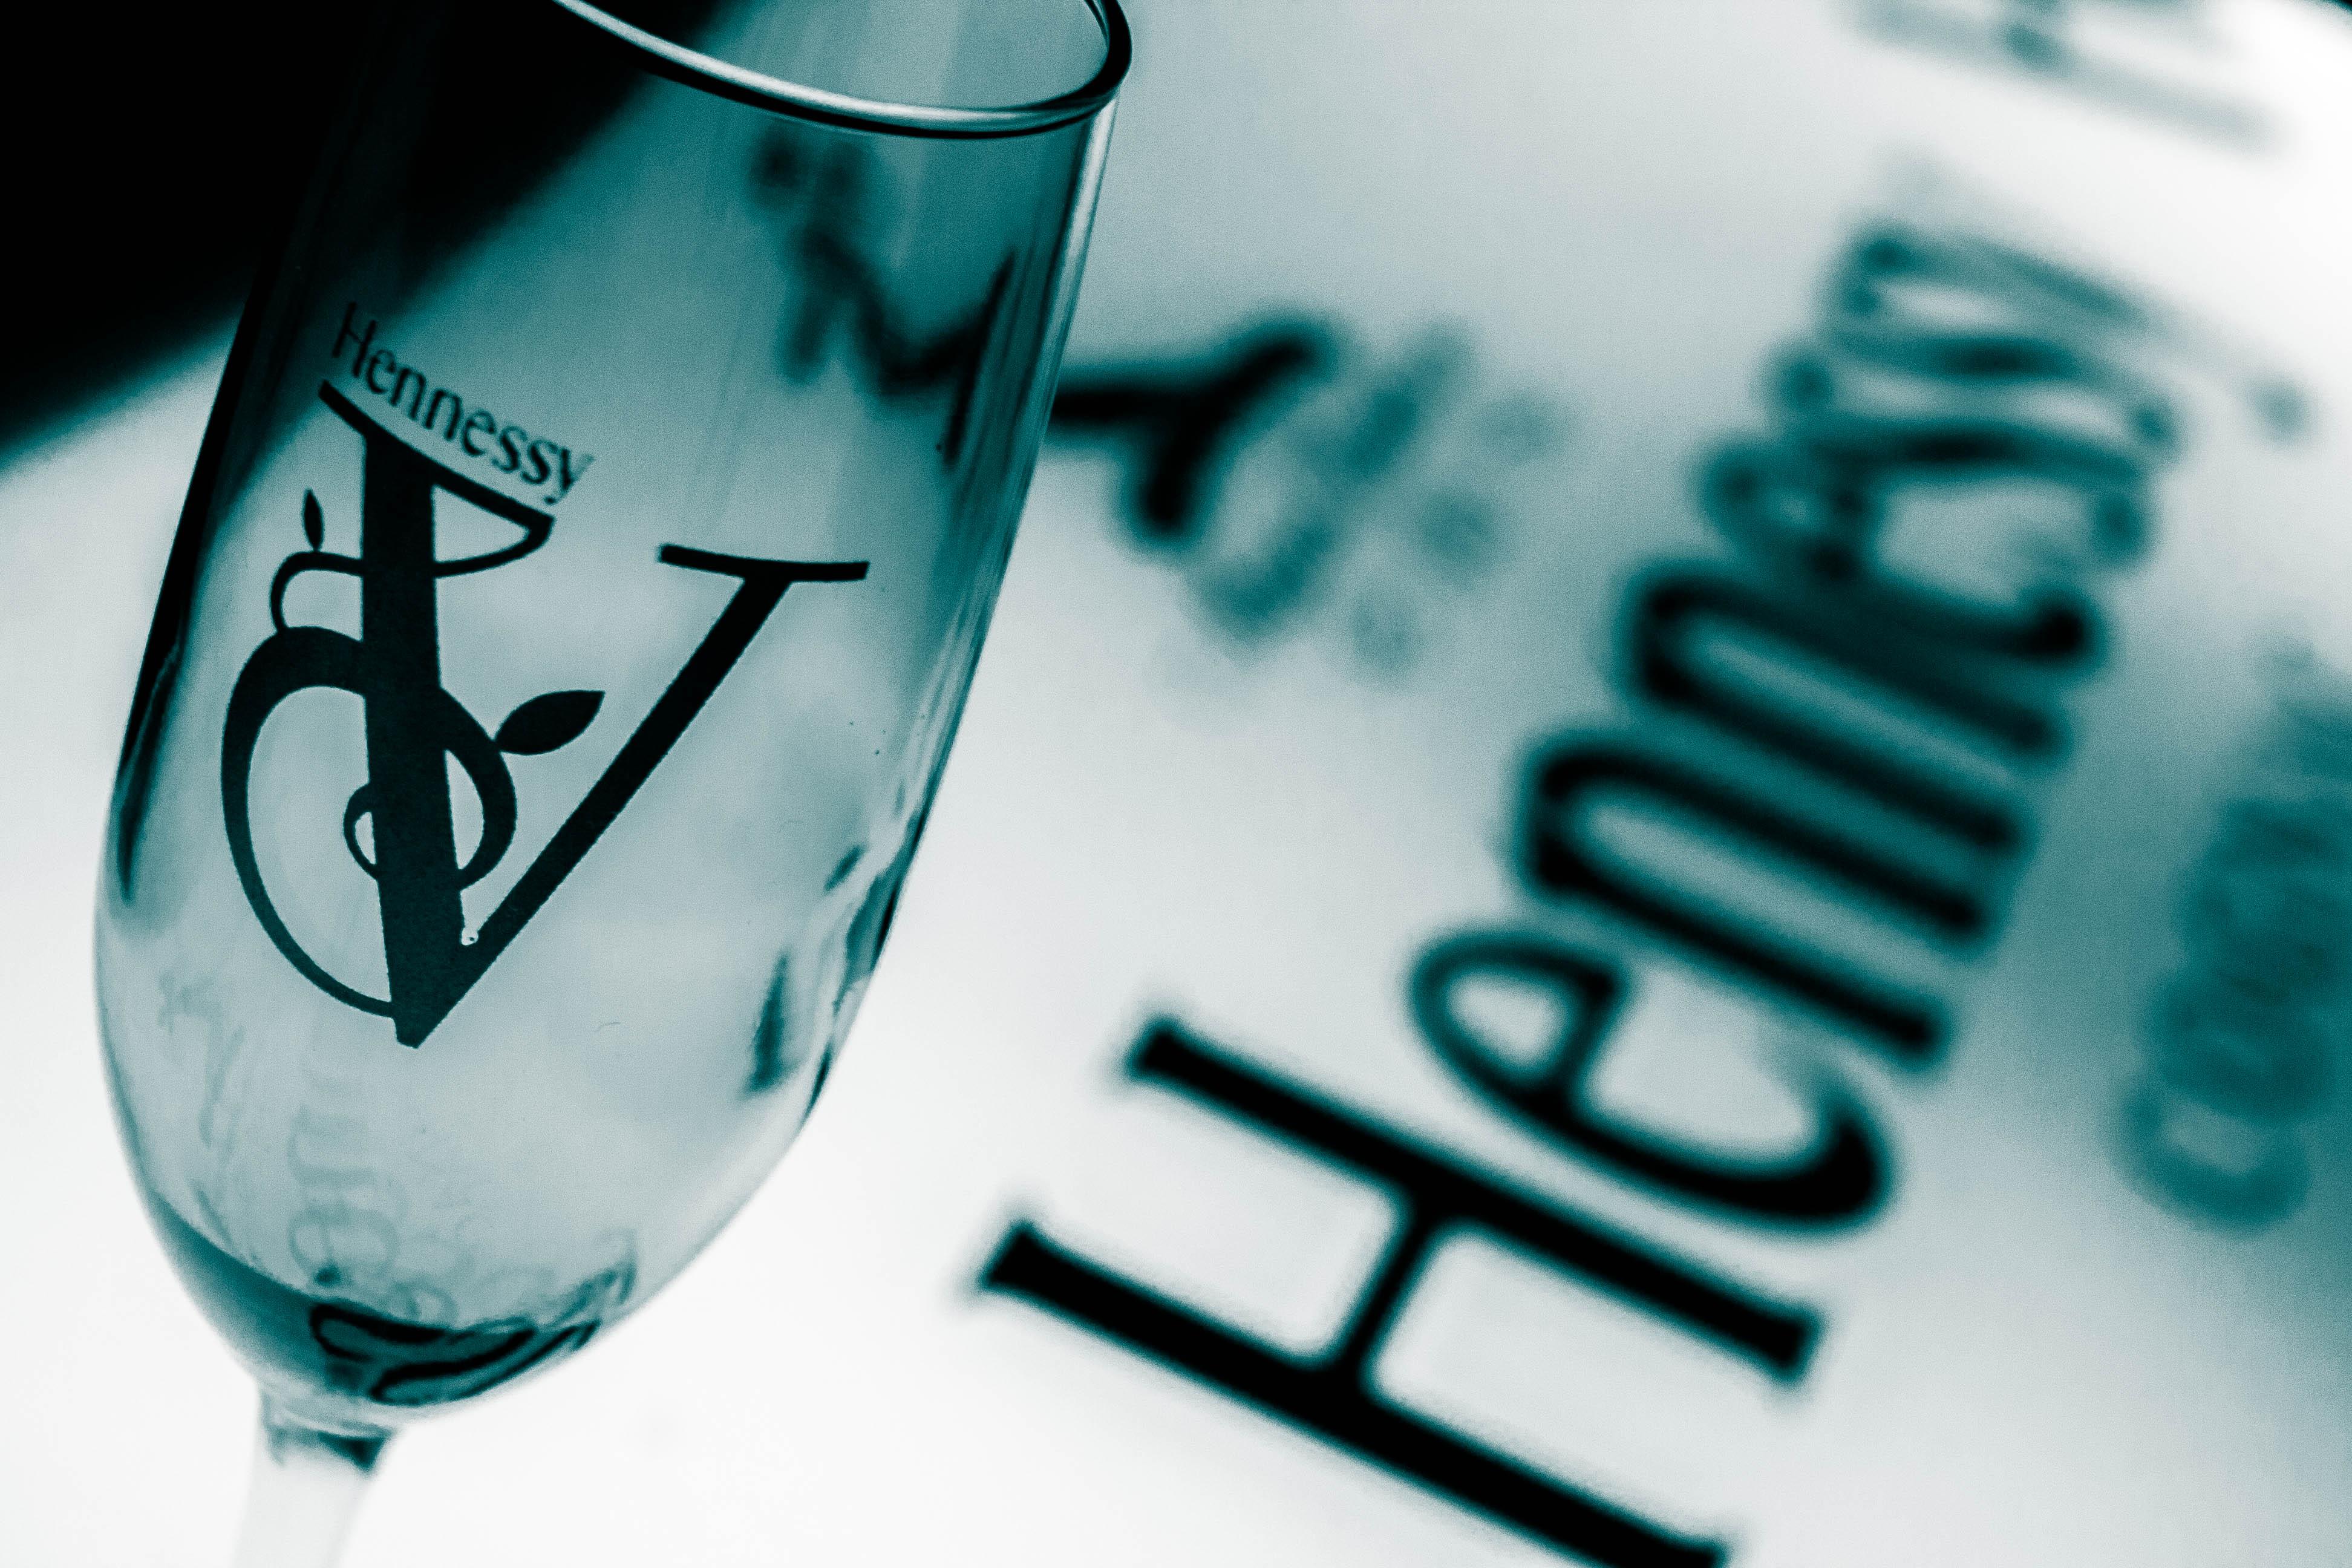 Hennessy Glass: Glass